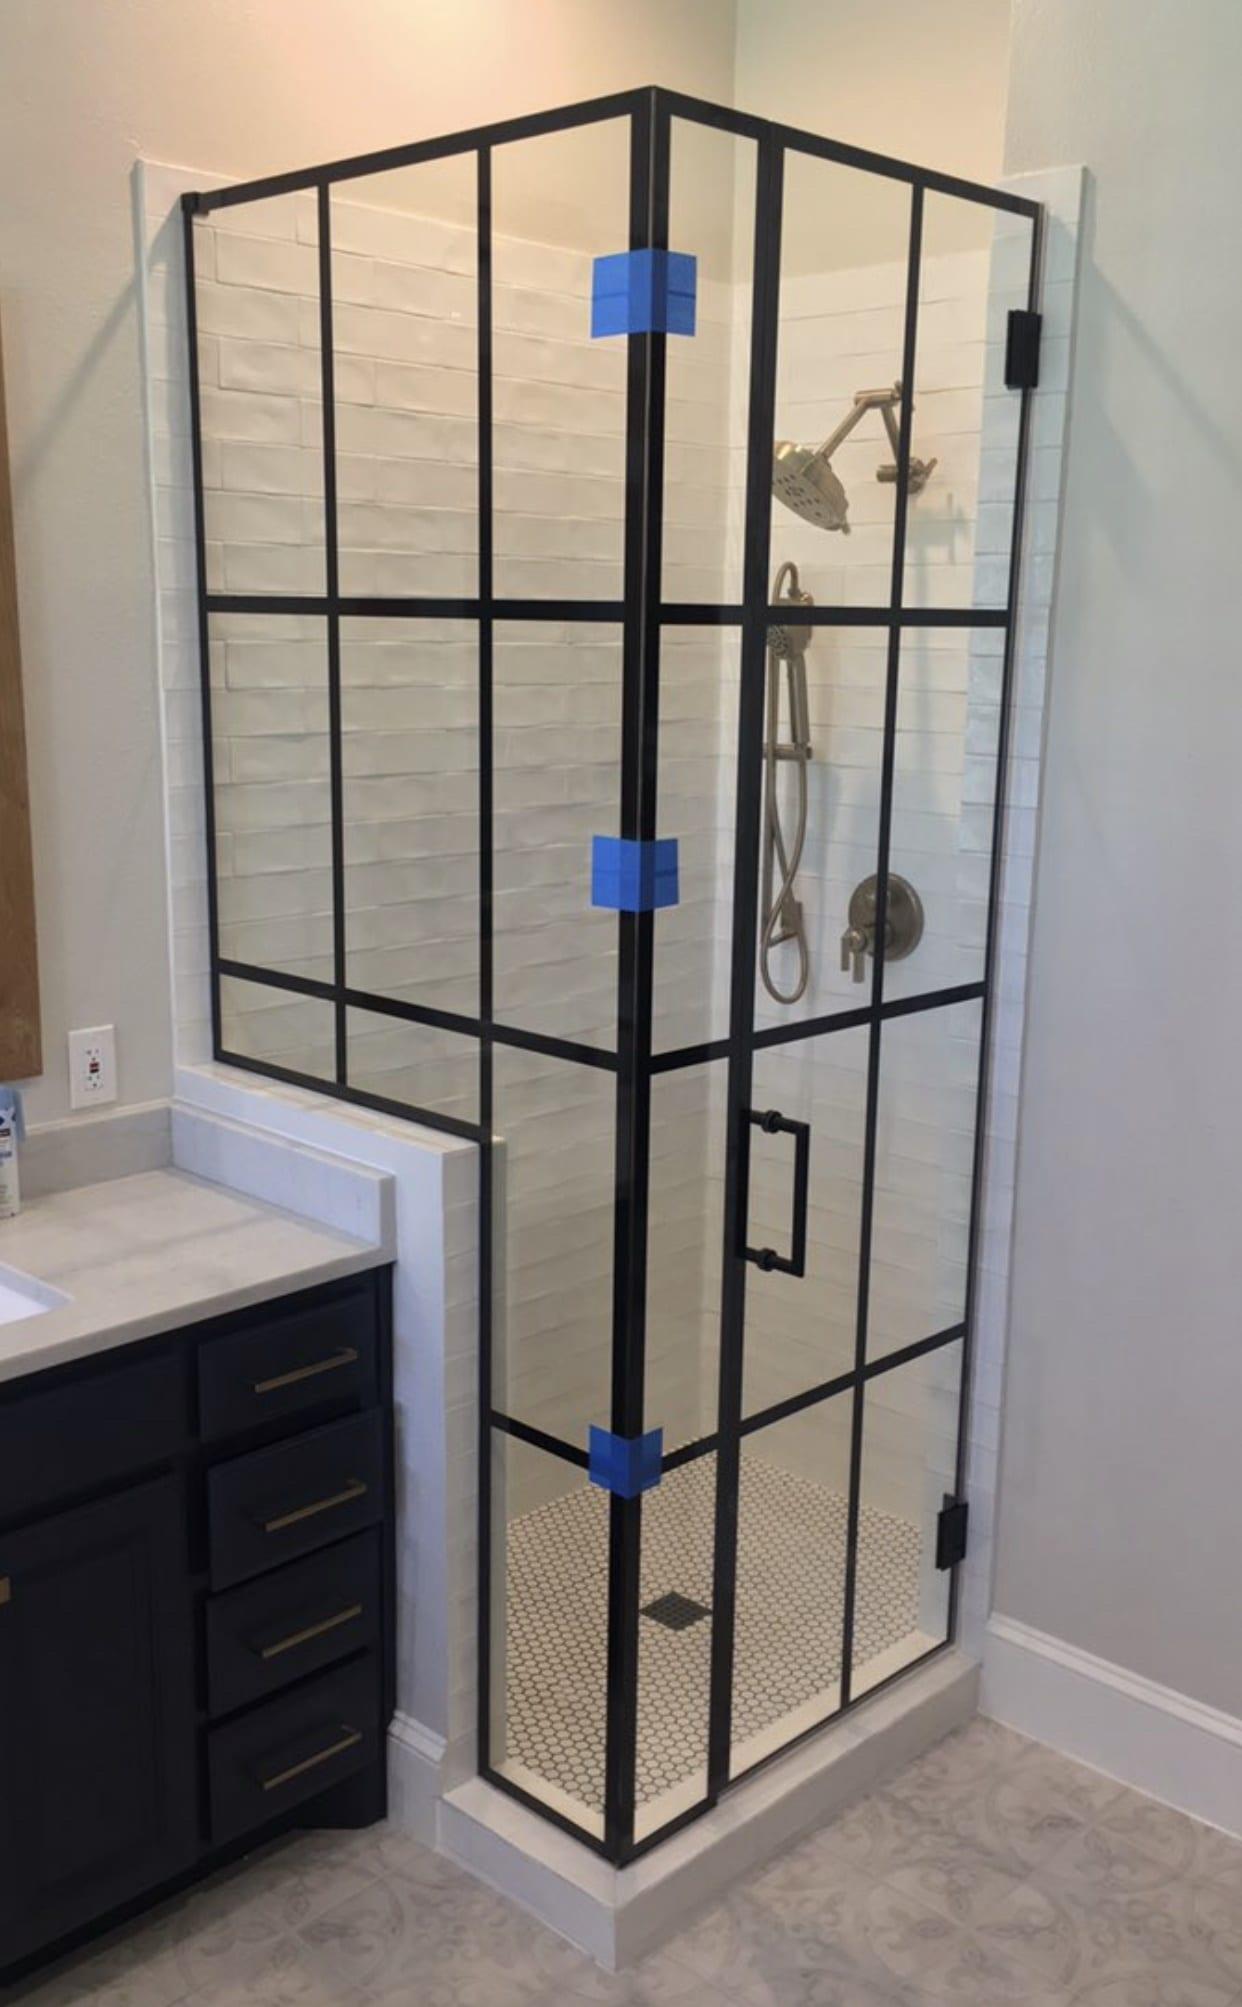 frameless shower doors img 2174 custom bathroom mirrors and decorative glass from Shower Doors of Nashville